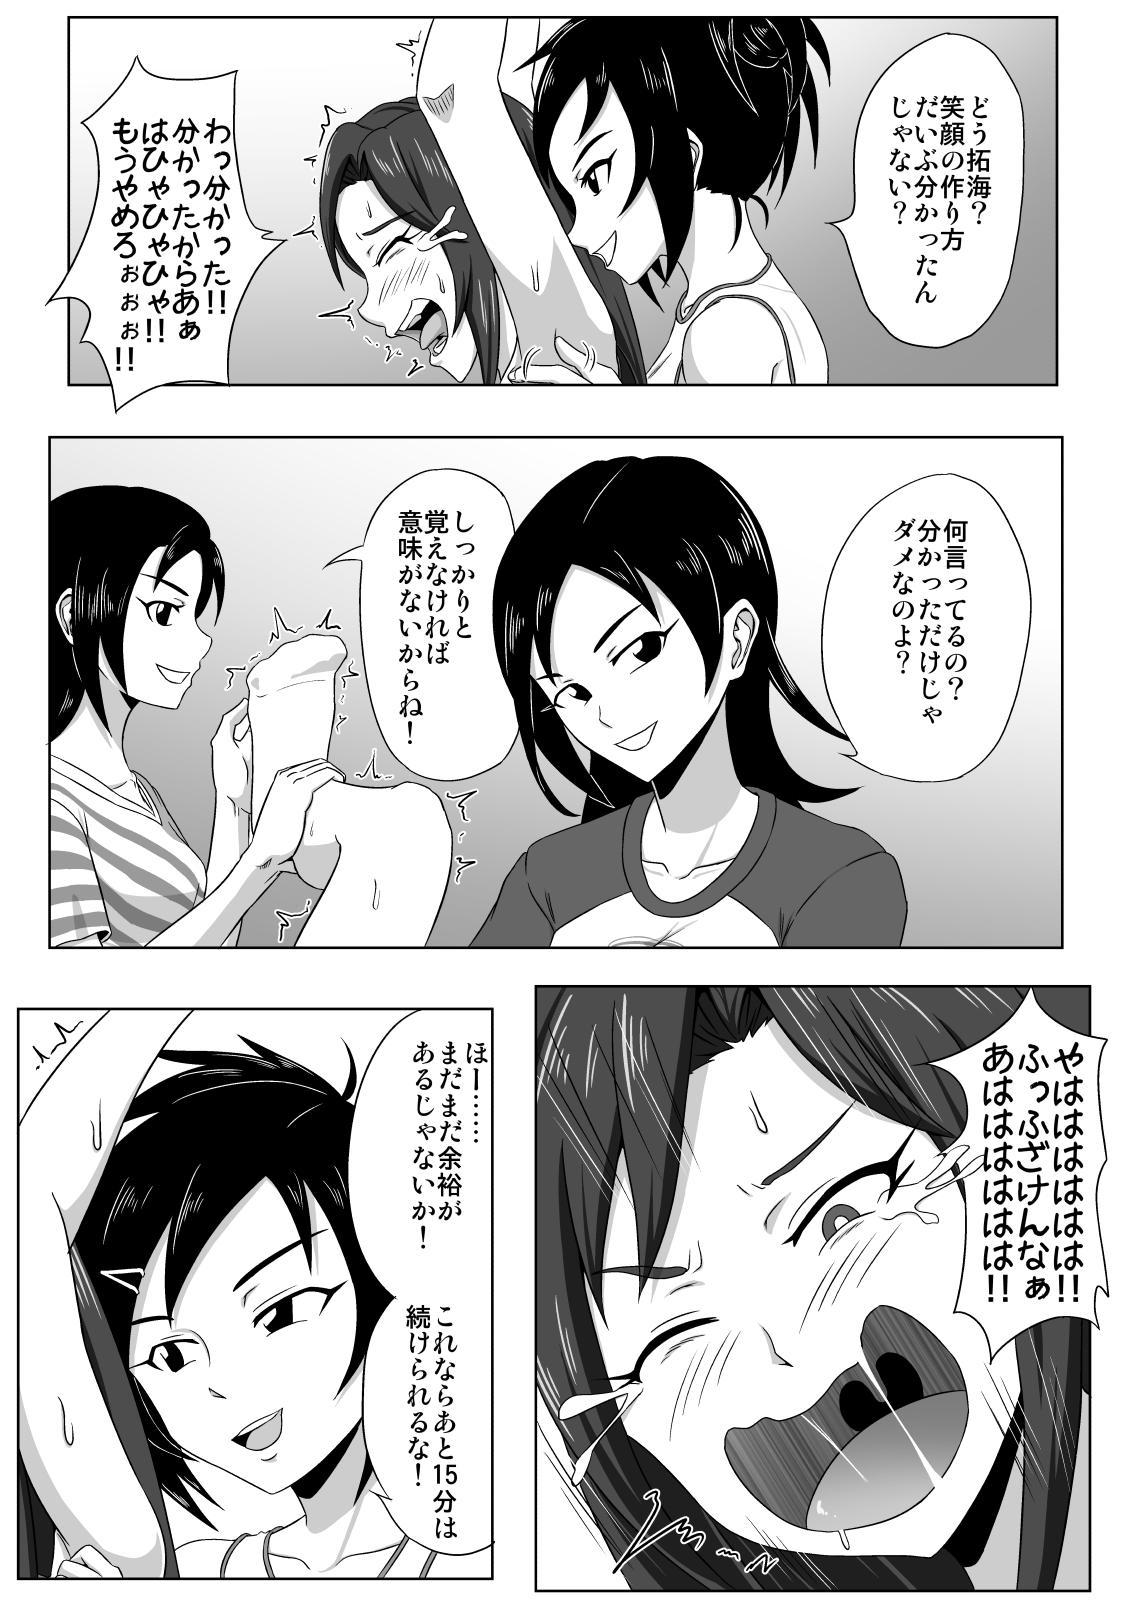 Tokkun! Takumin Smile 10